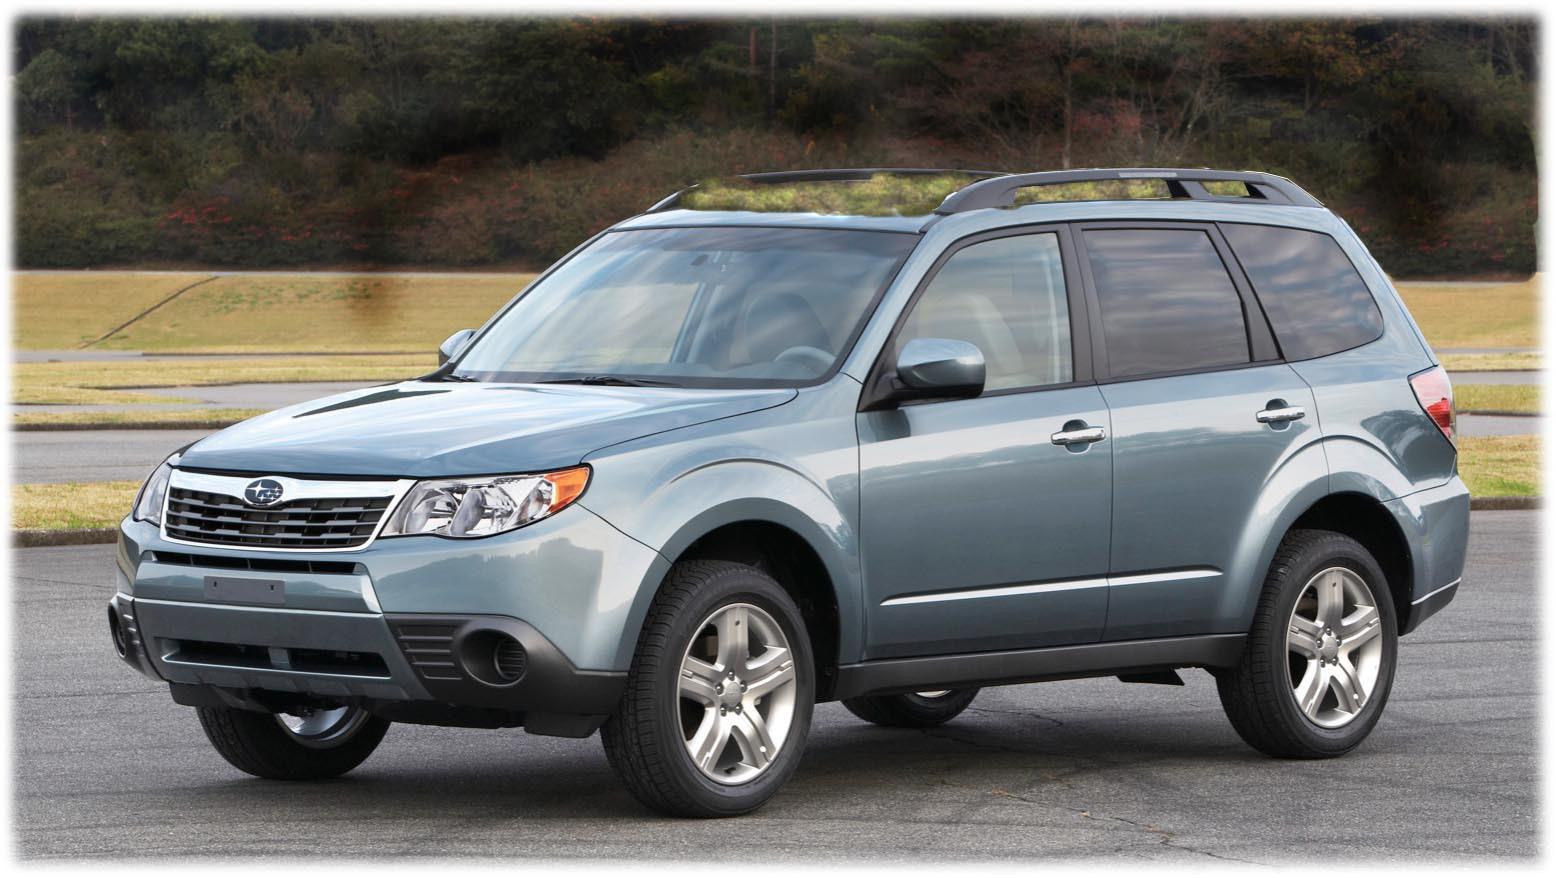 2010 subaru forester 25xt family car review 2010 subaru forester gets revolutionary green roof option vanachro Gallery